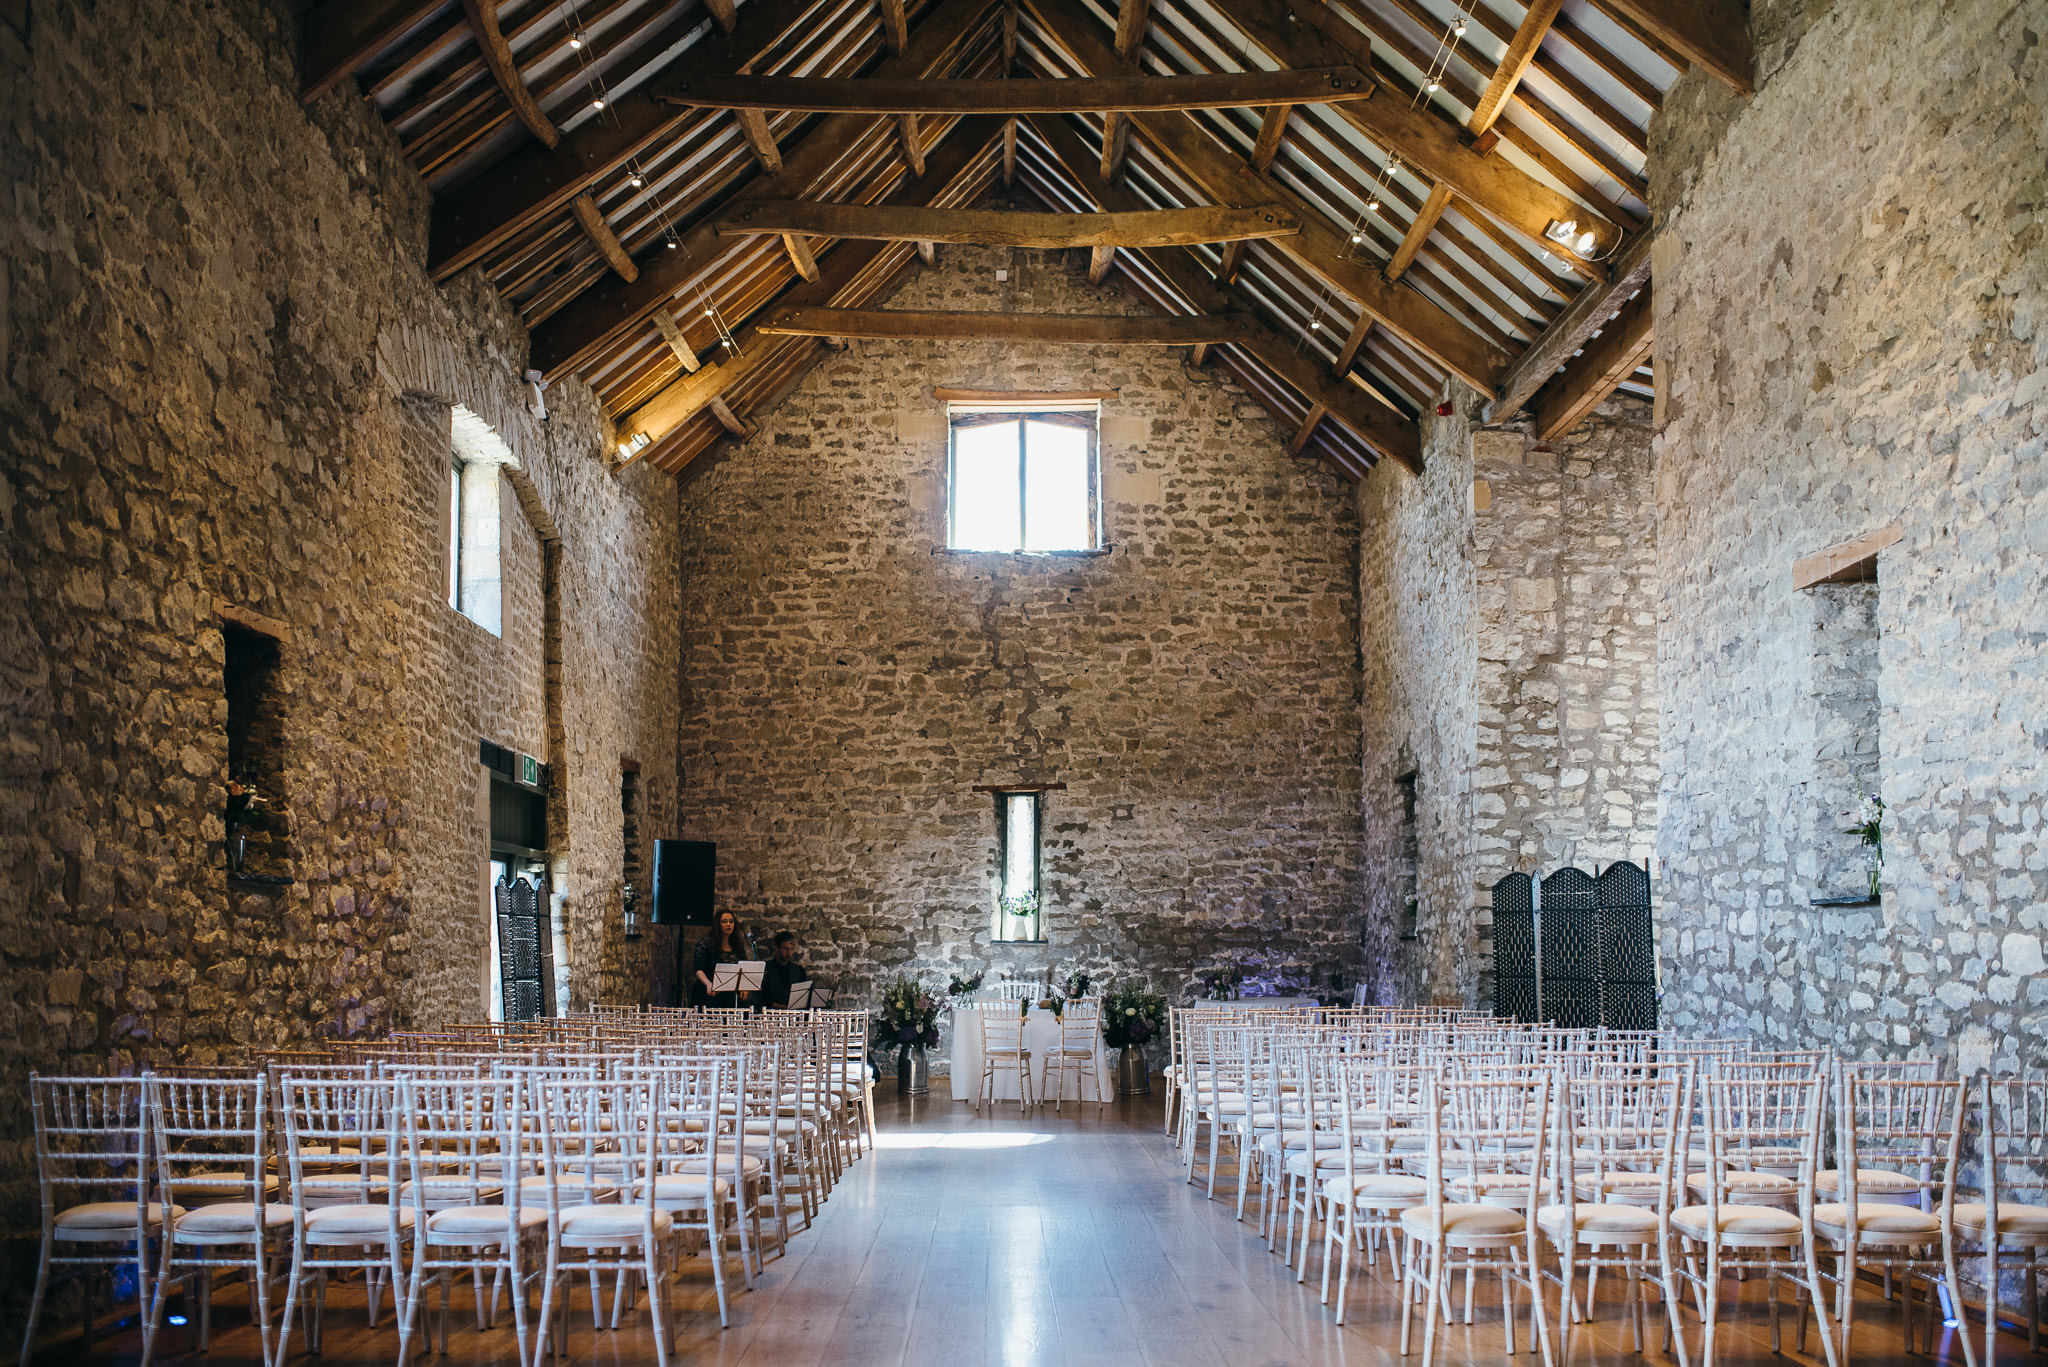 Priston Mill Wedding venue inside